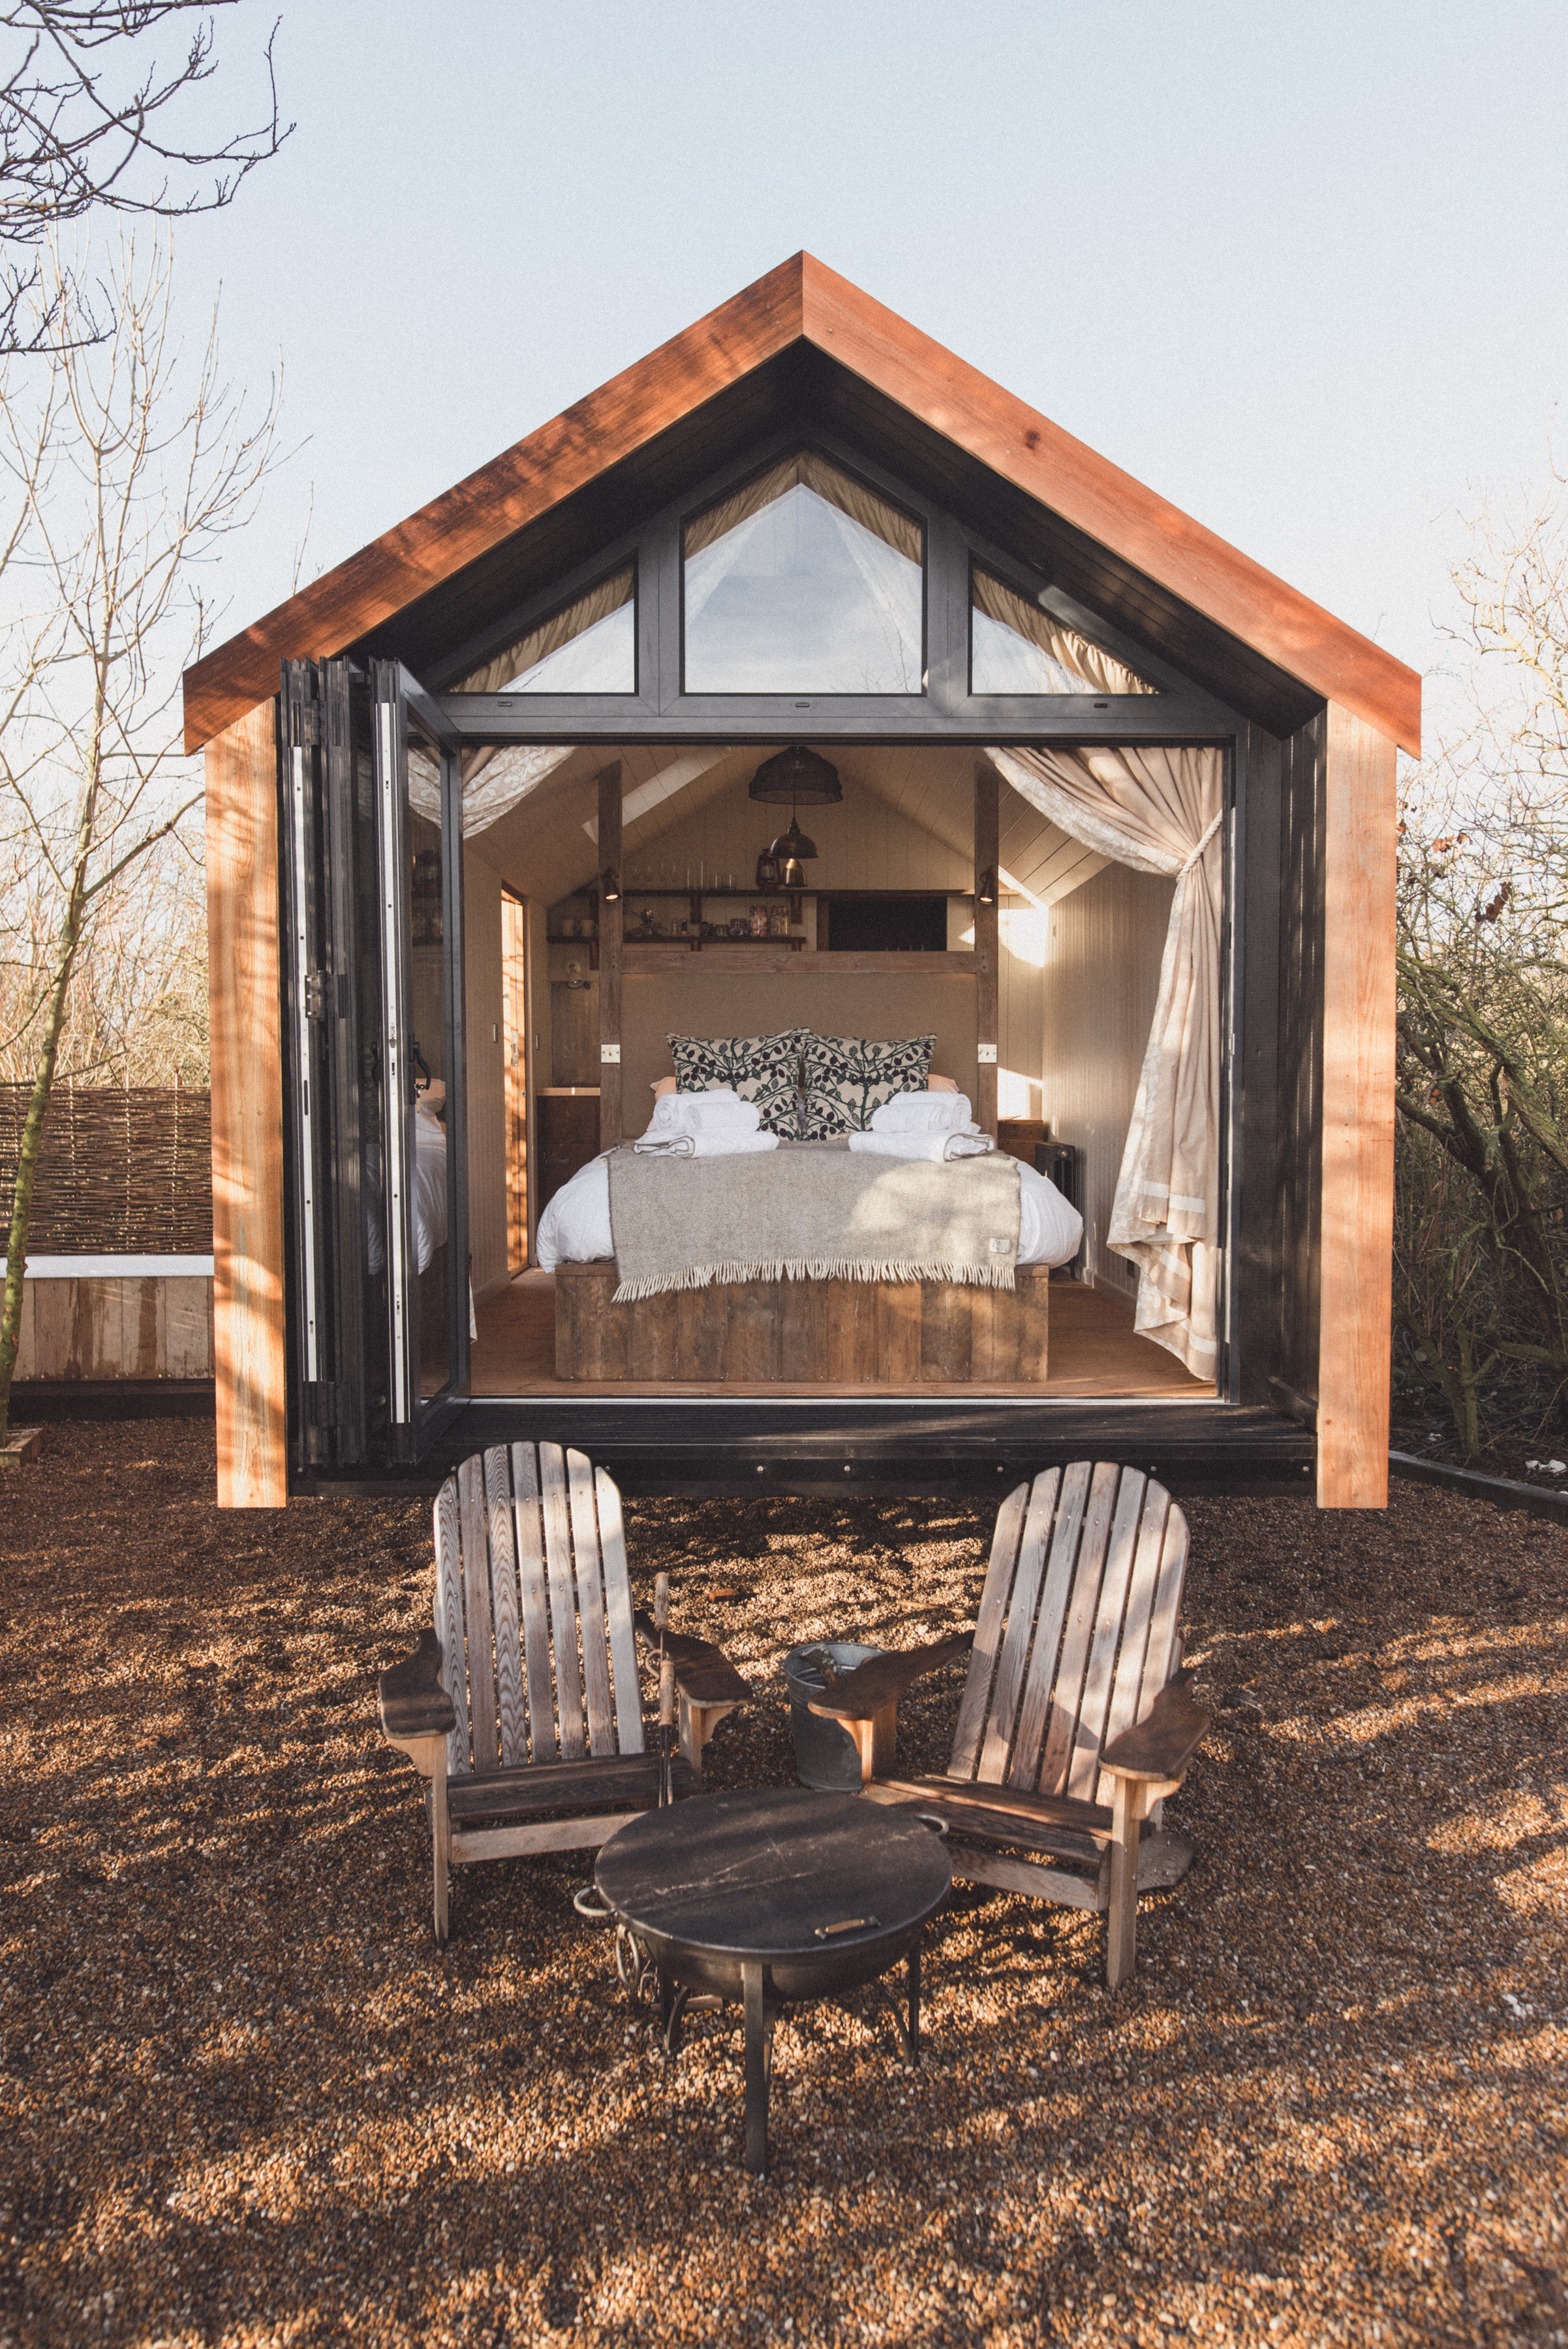 Elmley Damson Shepherd Hut by Rebecca Douglas Photography -209.jpg